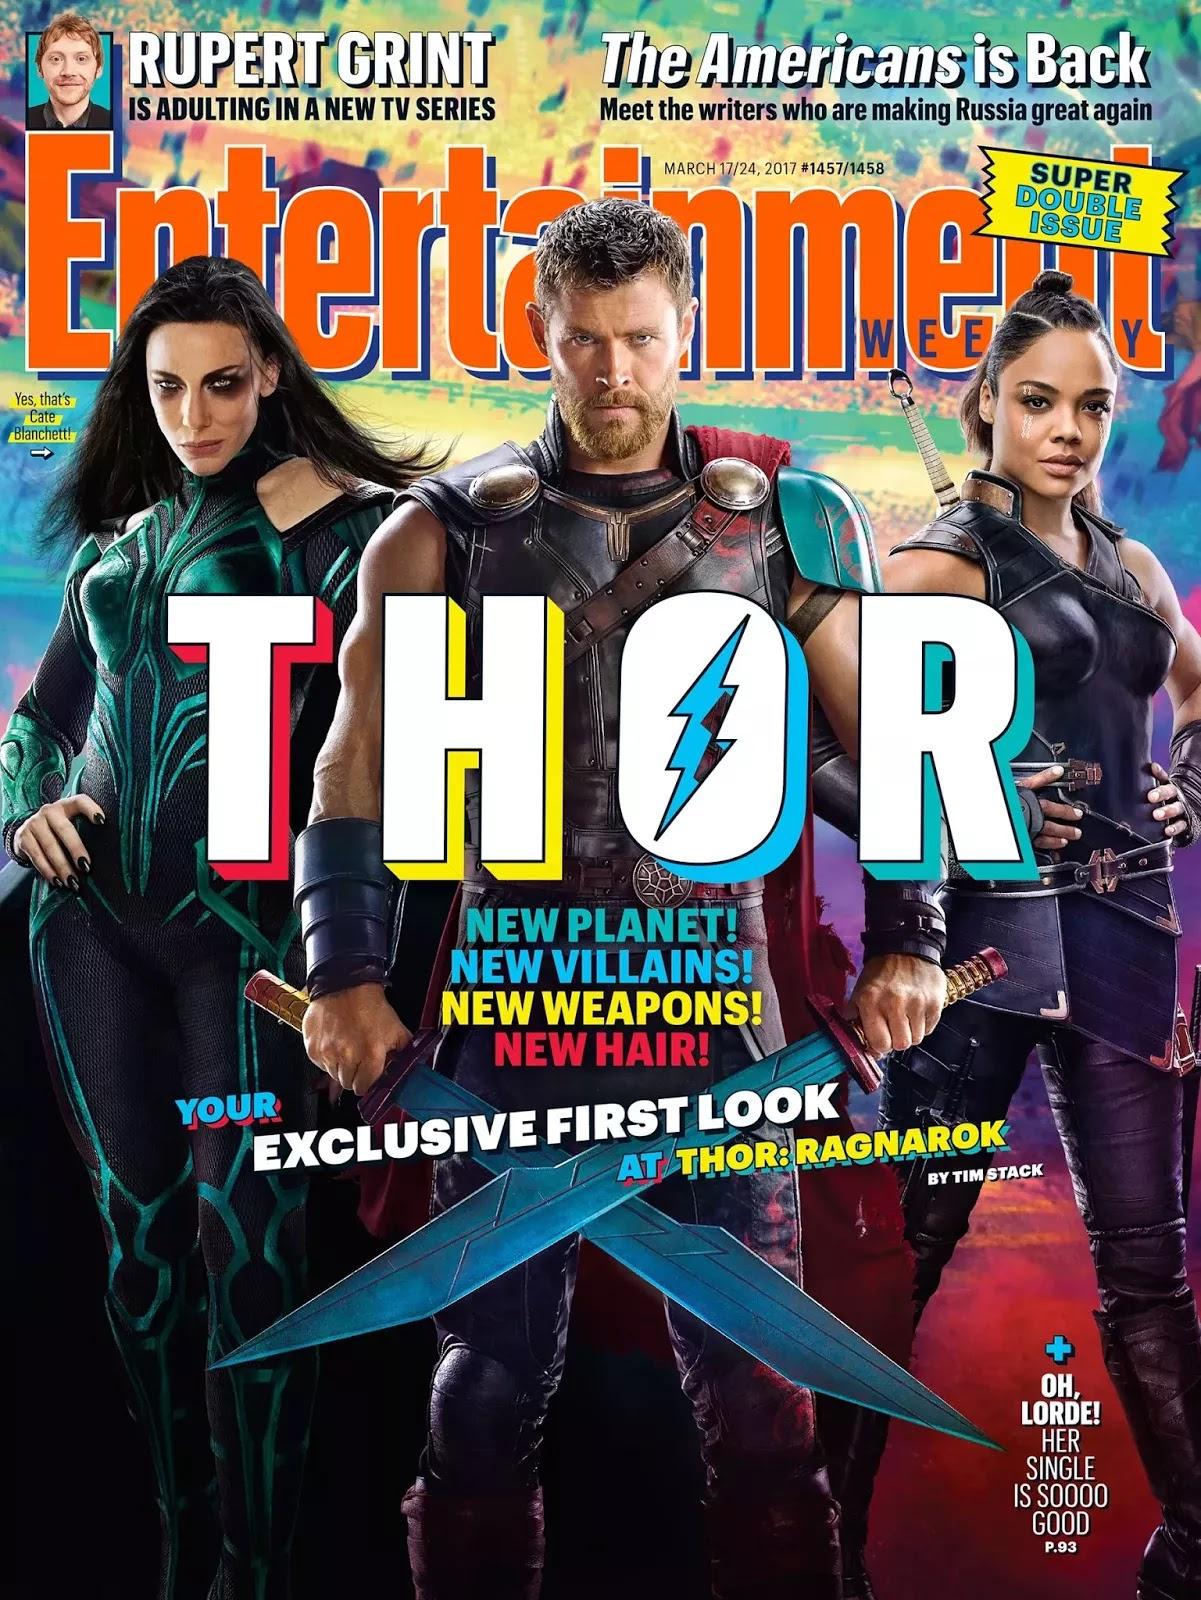 Chris Hemsworth Gets New Look In Thor: Ragnarok.